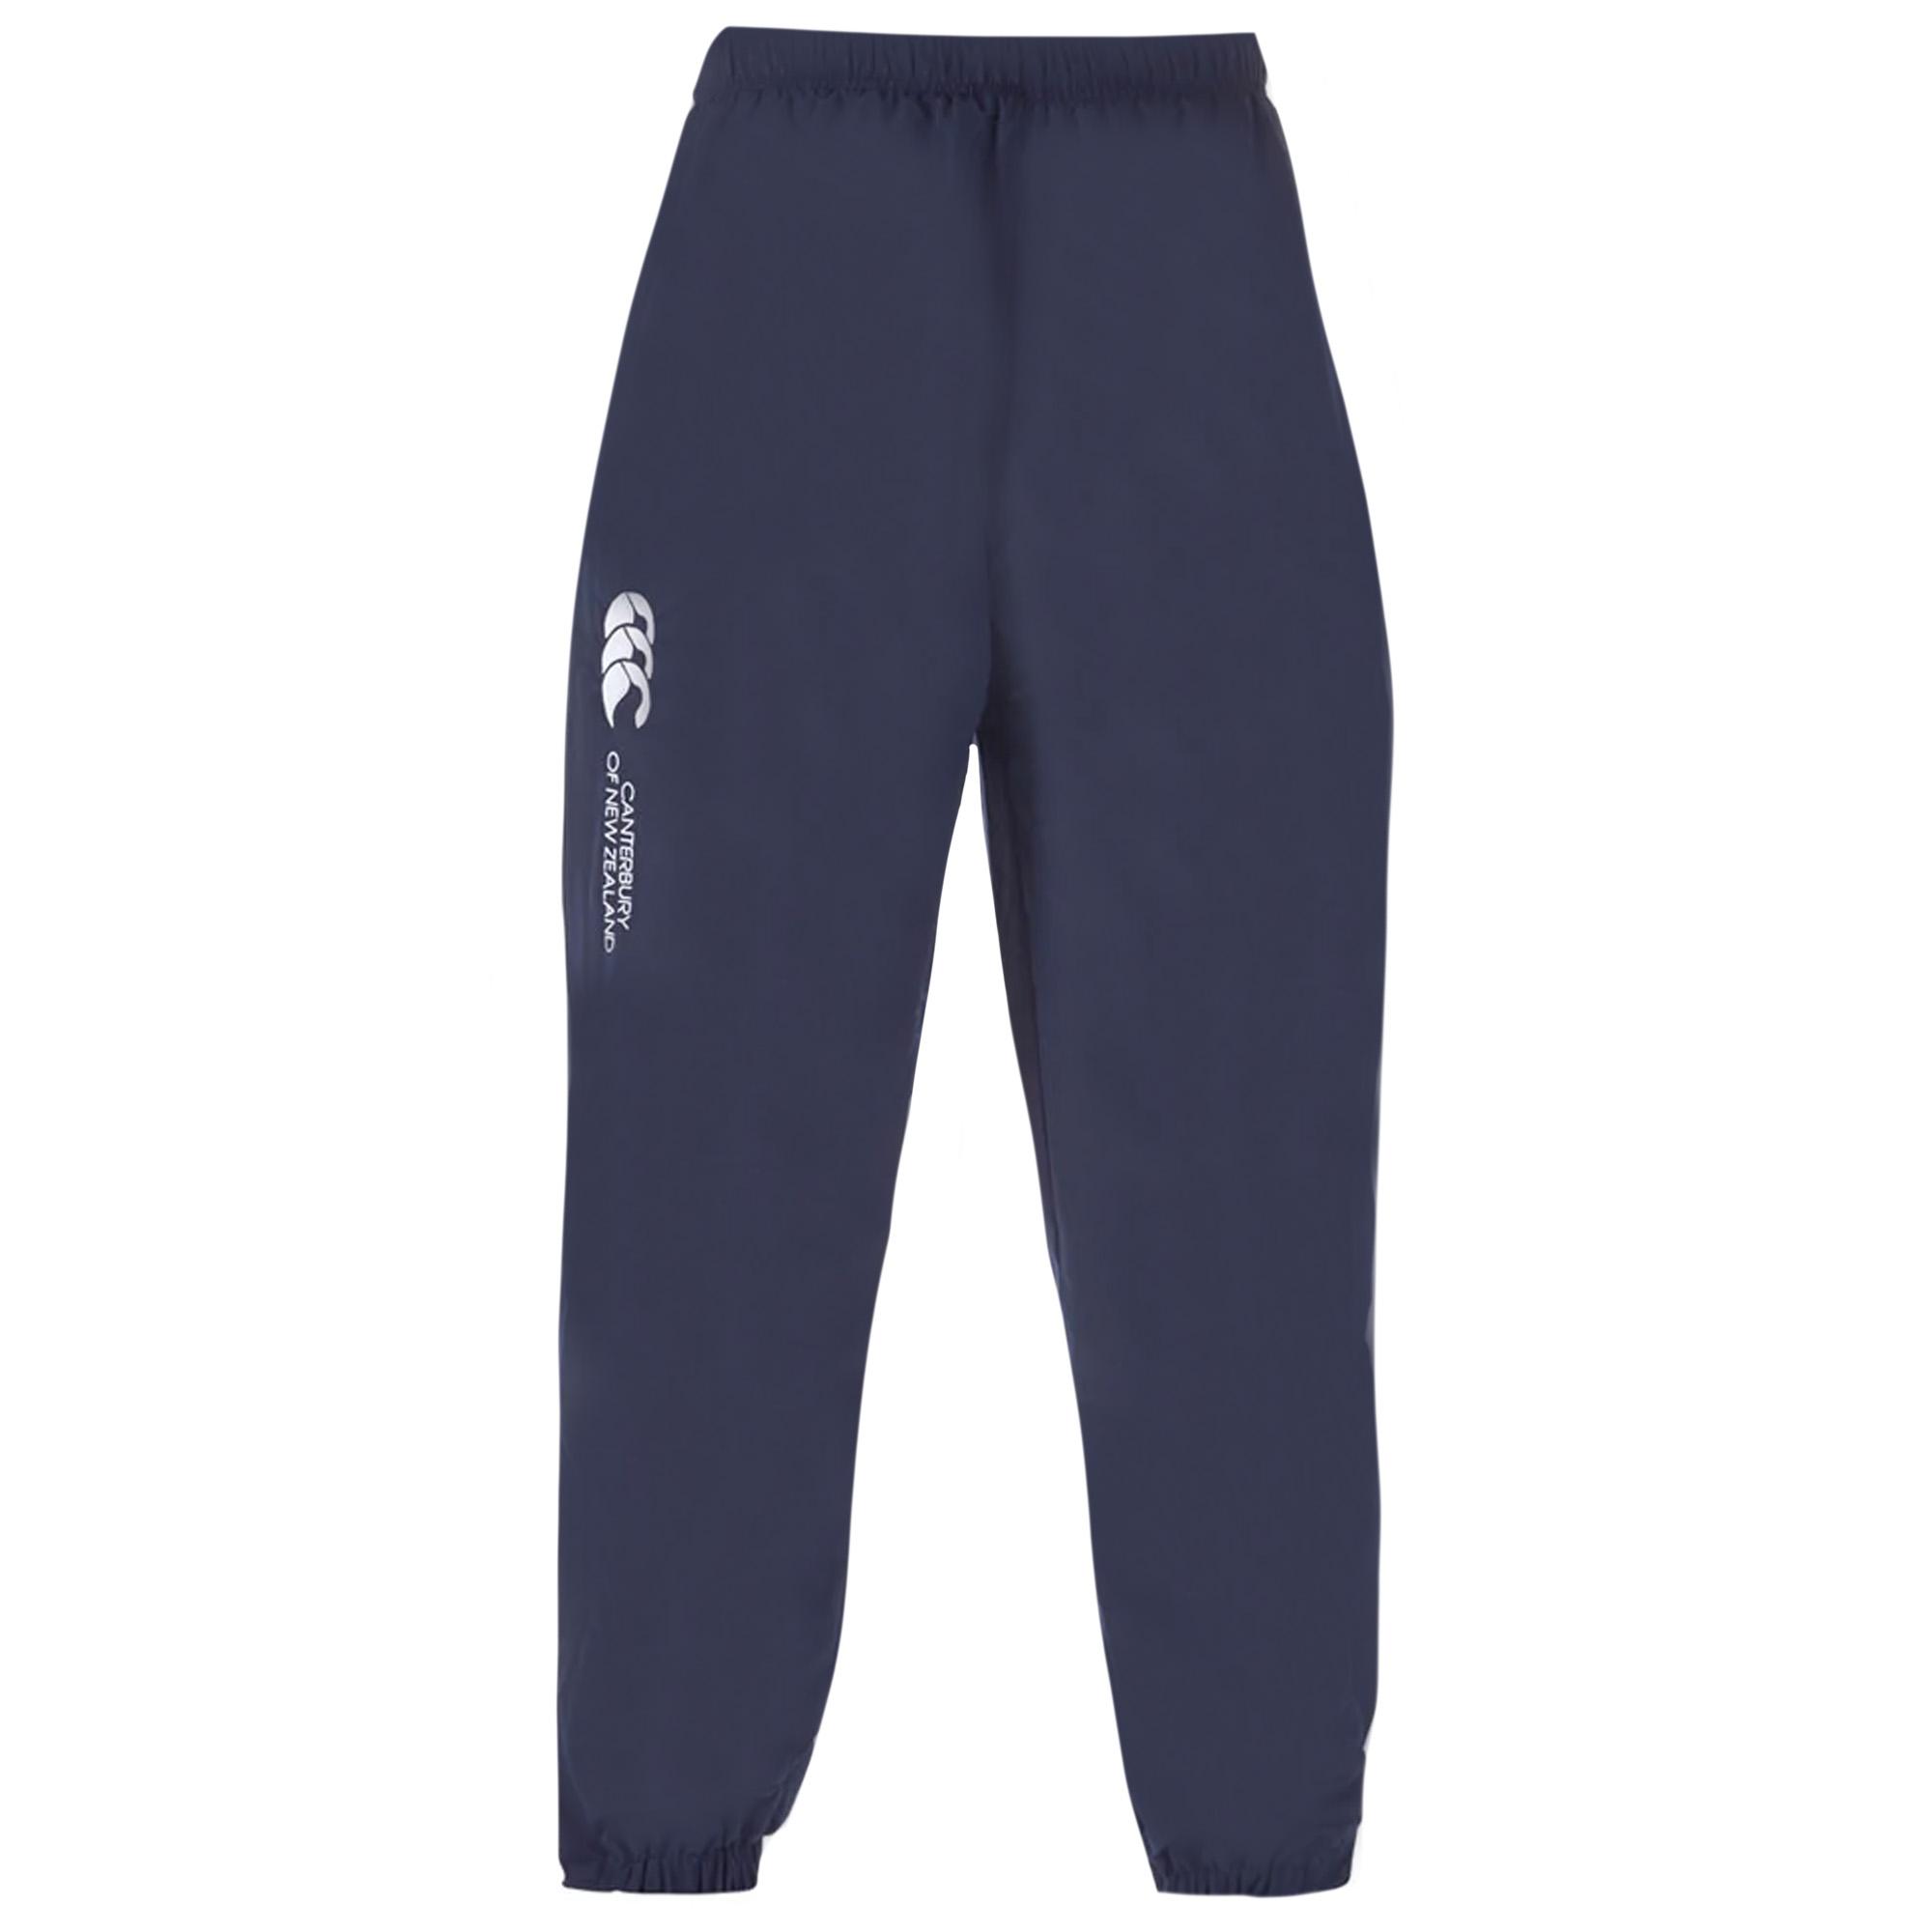 Canterbury Mens Stadium Elasticated Sports Trousers (XXL) (Black)